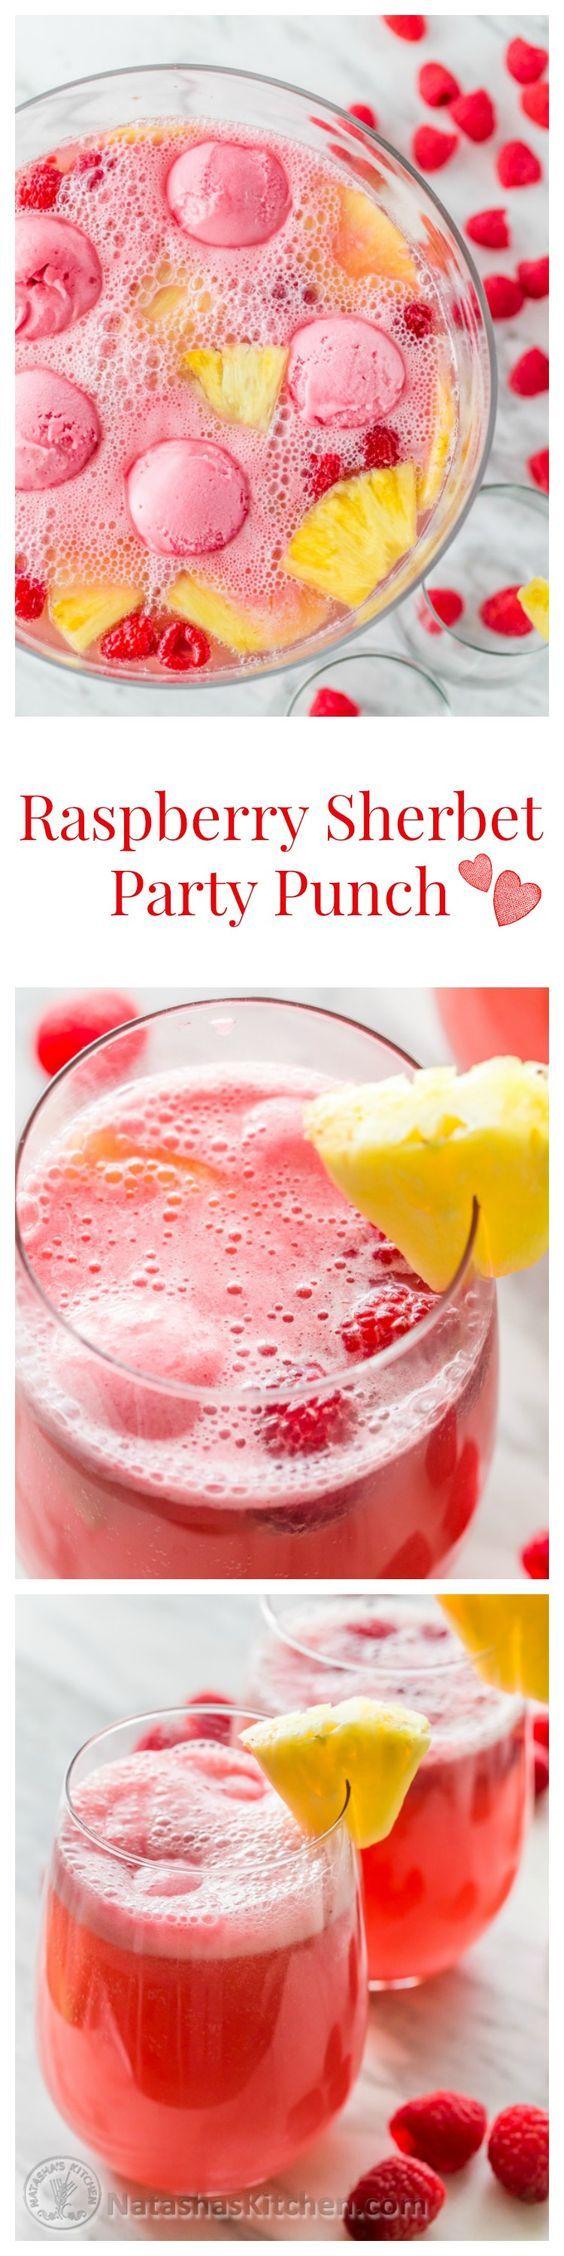 Best 25+ Bridal shower punch ideas on Pinterest | Bridal shower ...